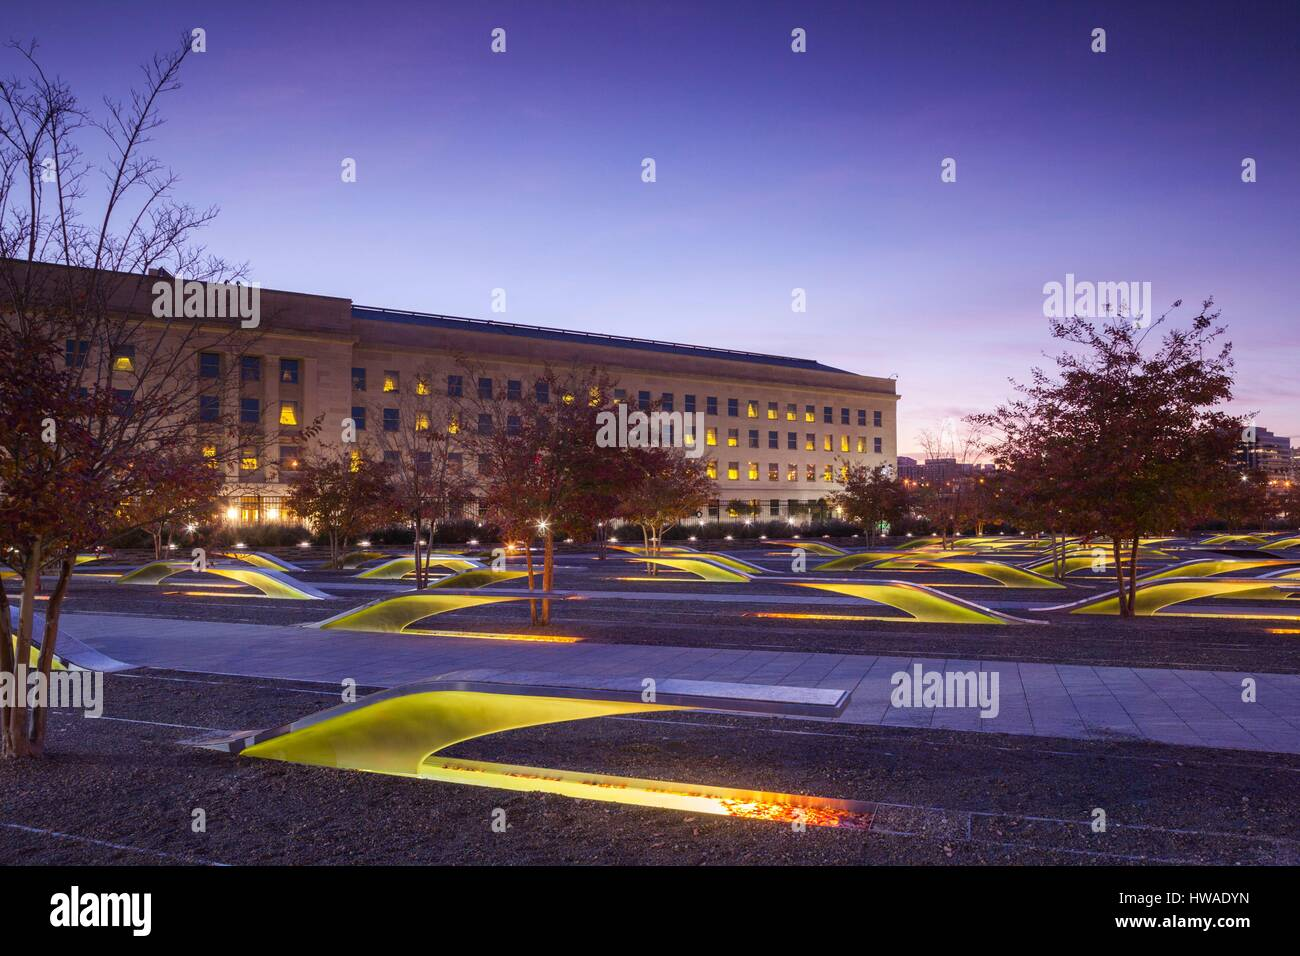 United States, Virginia, Arlington The Pentagon, Pentagon 911 Memorial, dawn - Stock Image